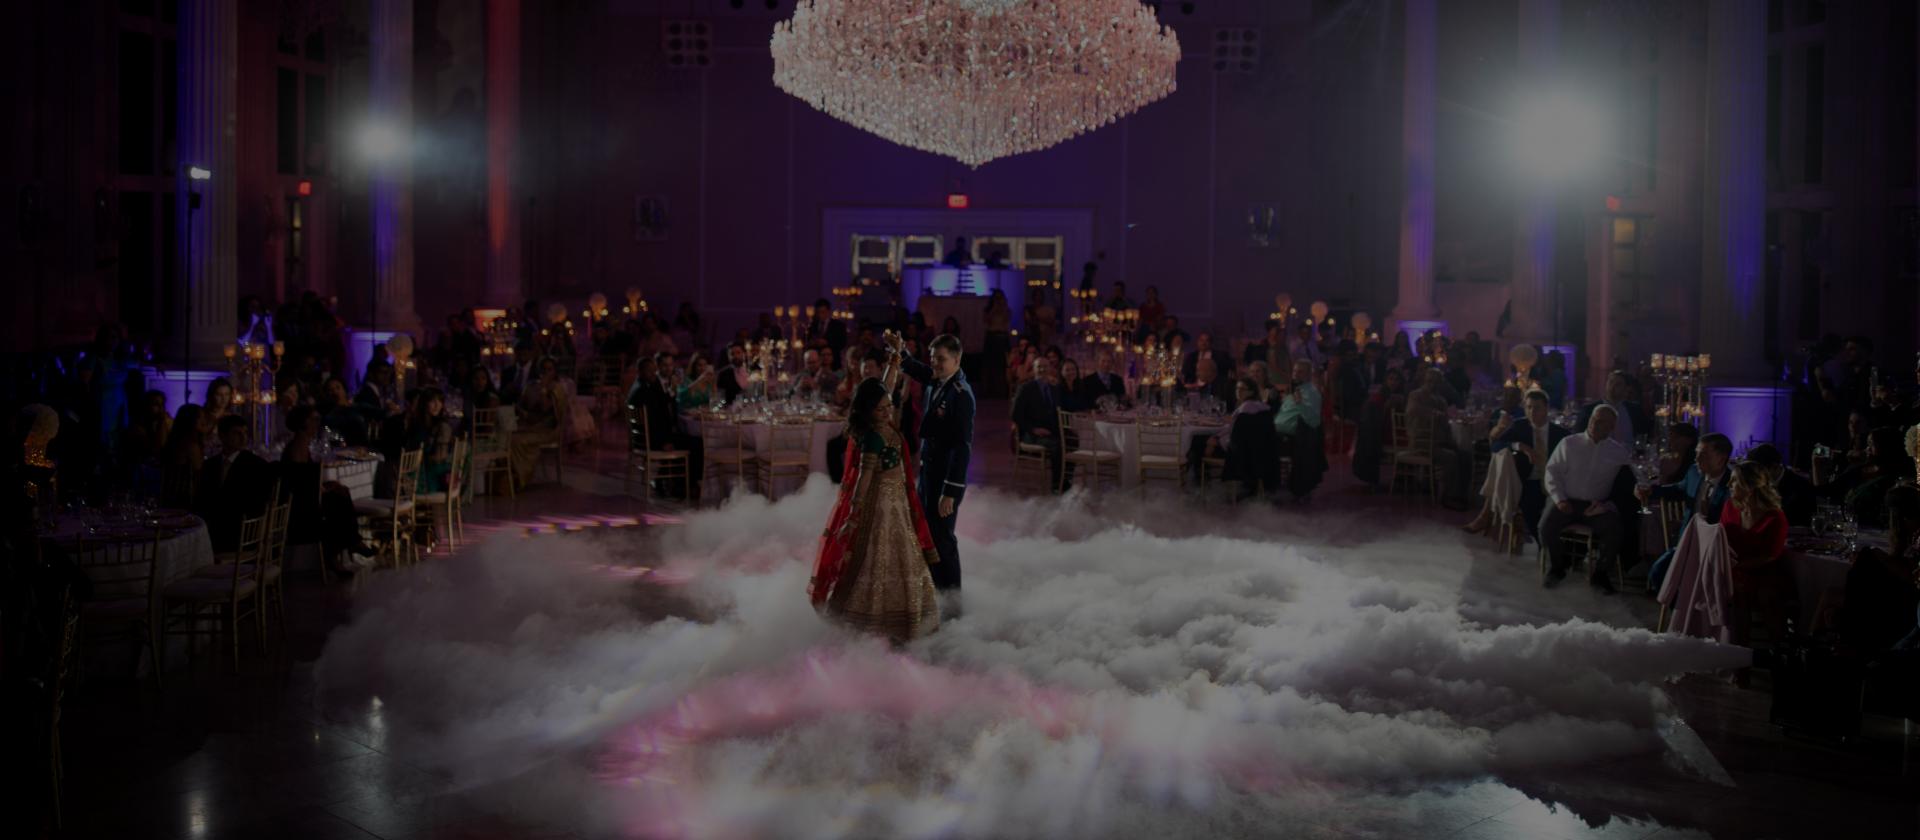 Professional Wedding/Event Planner